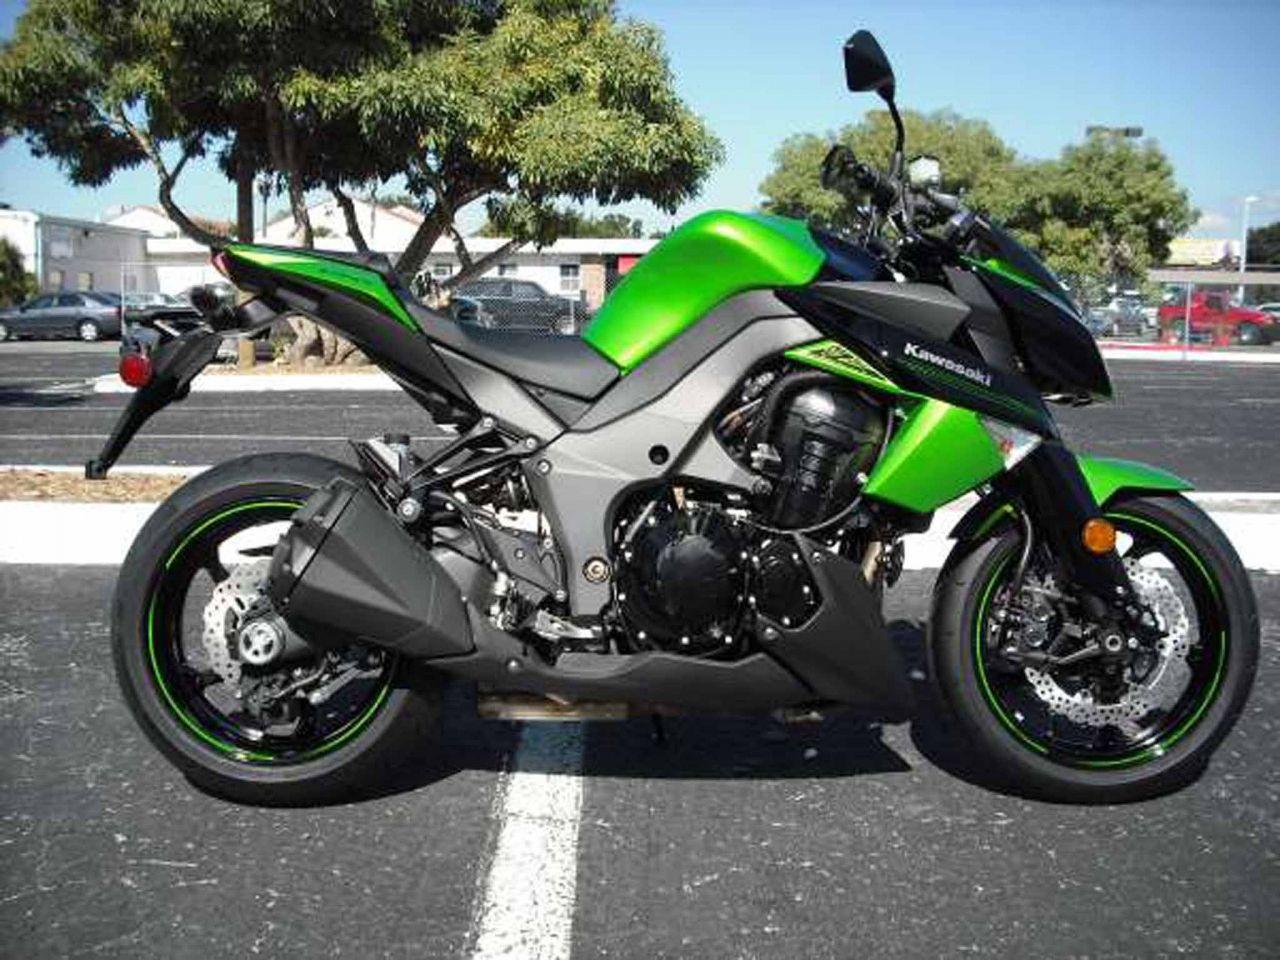 Kawasaki Z1000 Green Image